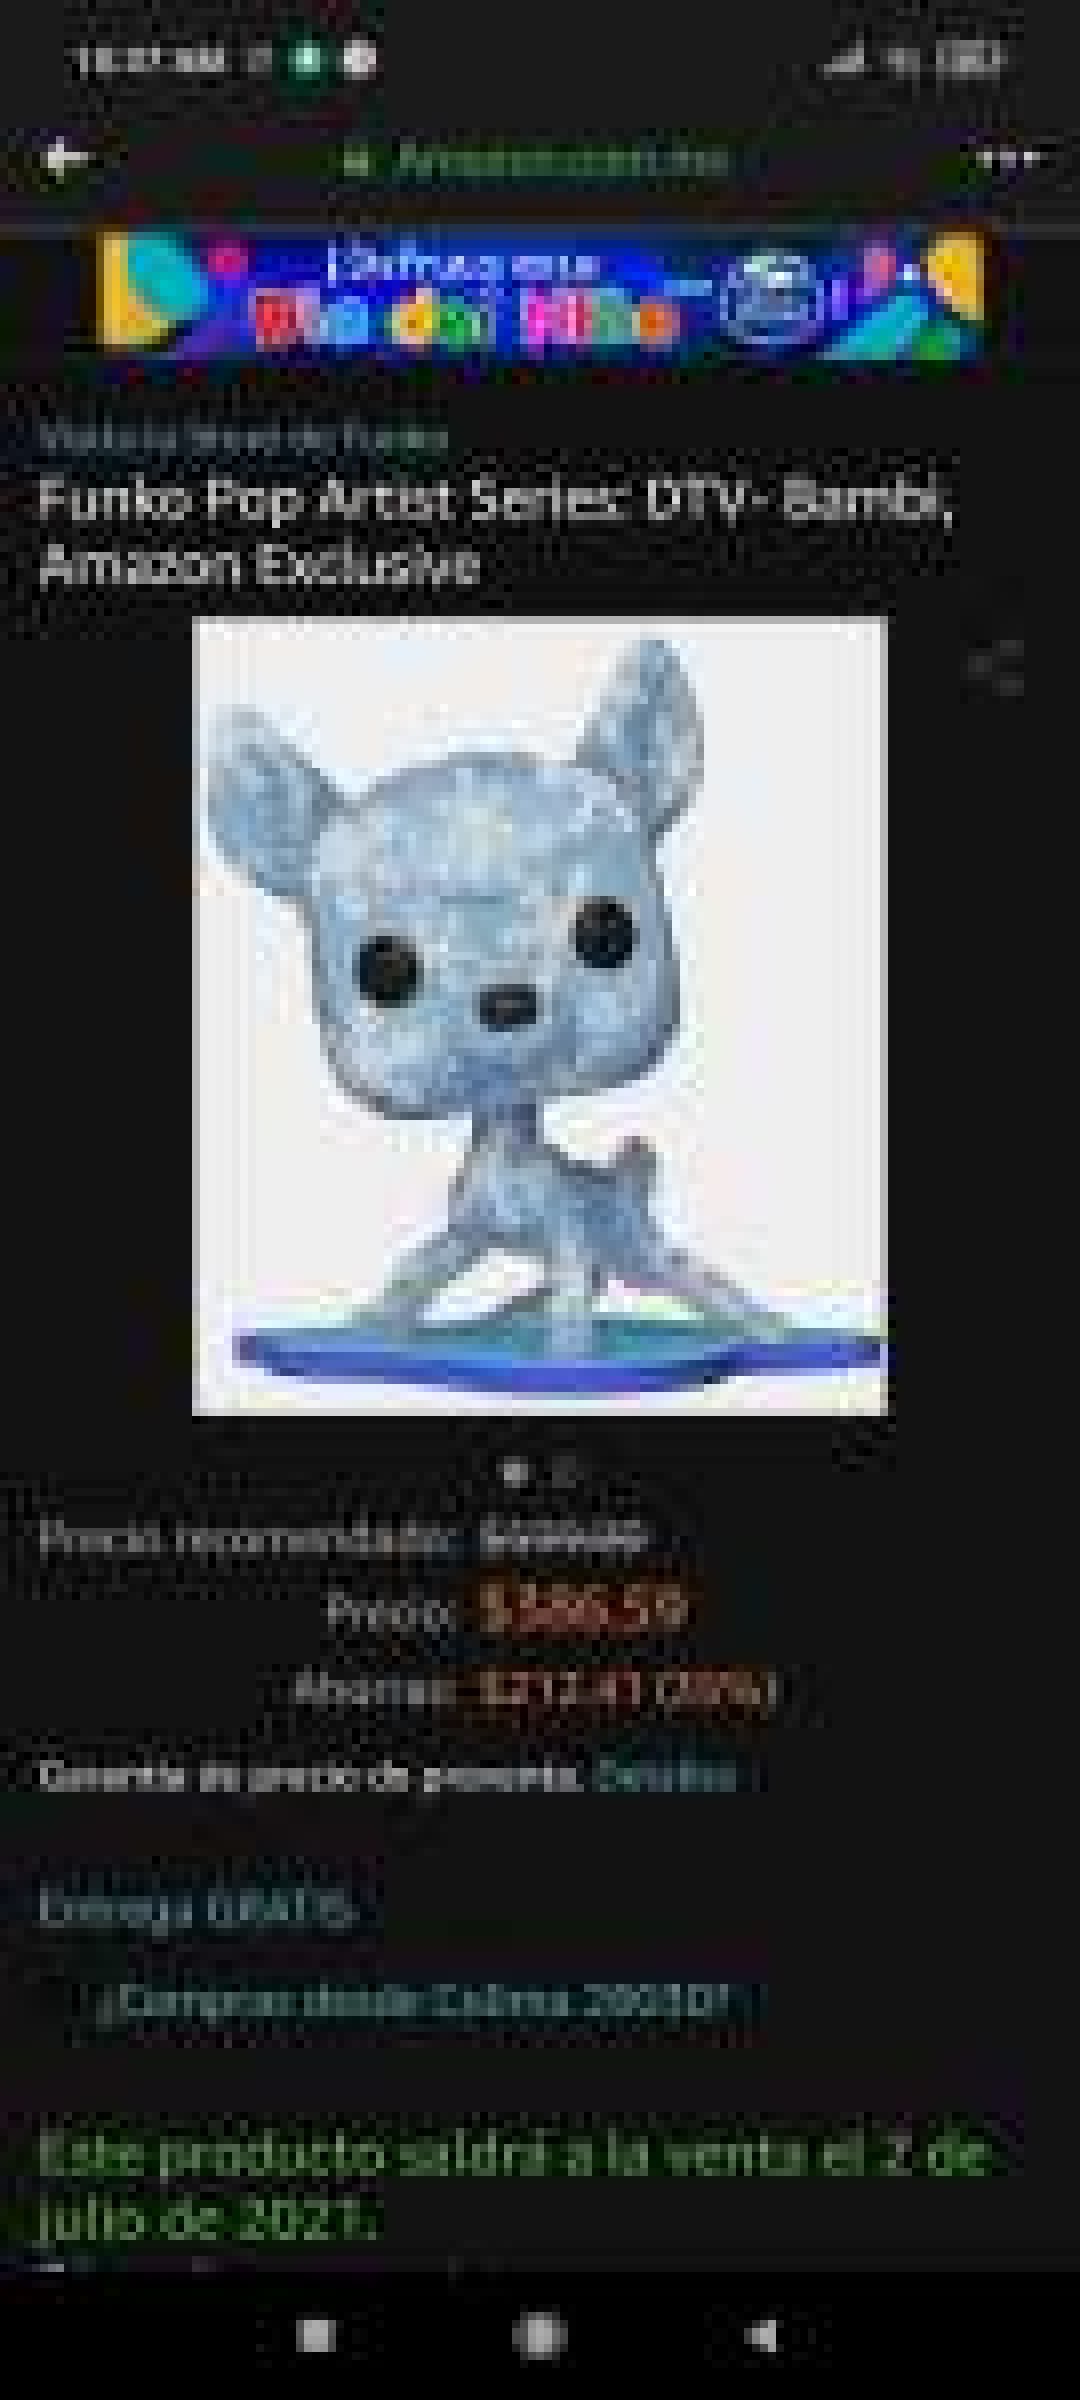 Amazon, Funko bambi arts de 599-386.59